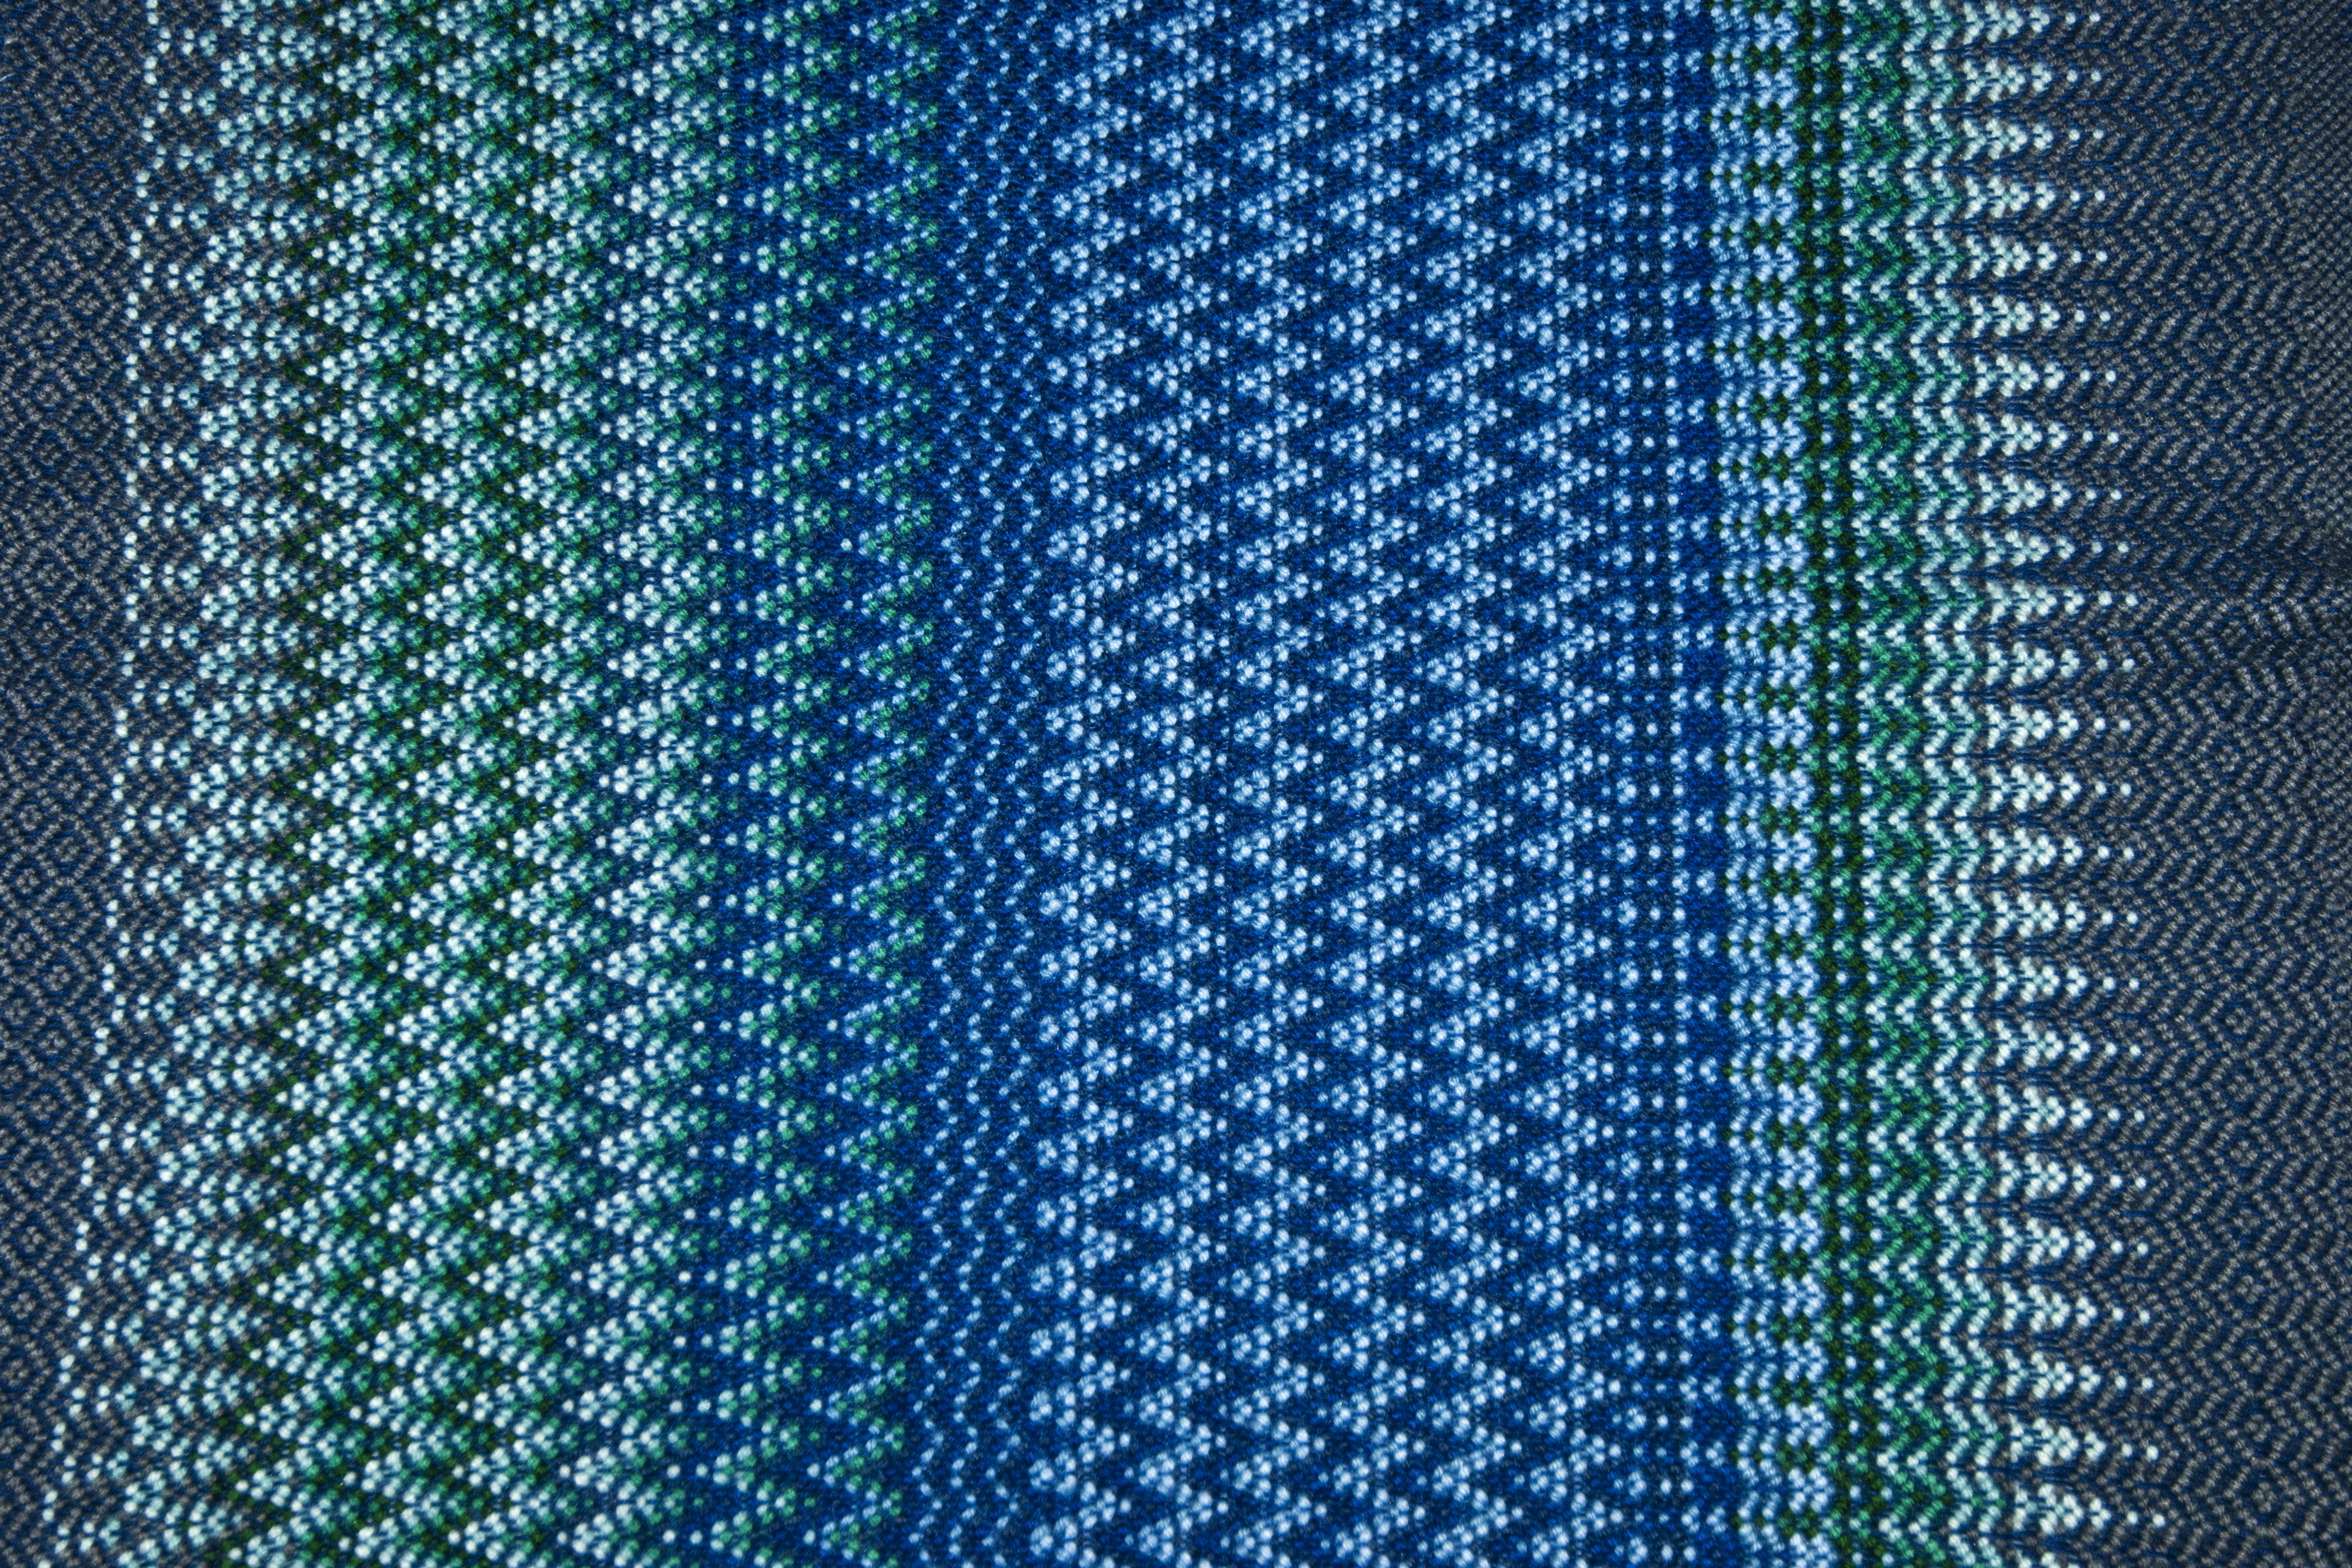 Norwegian Krokbragd using acrylic yarn in shades of blue.